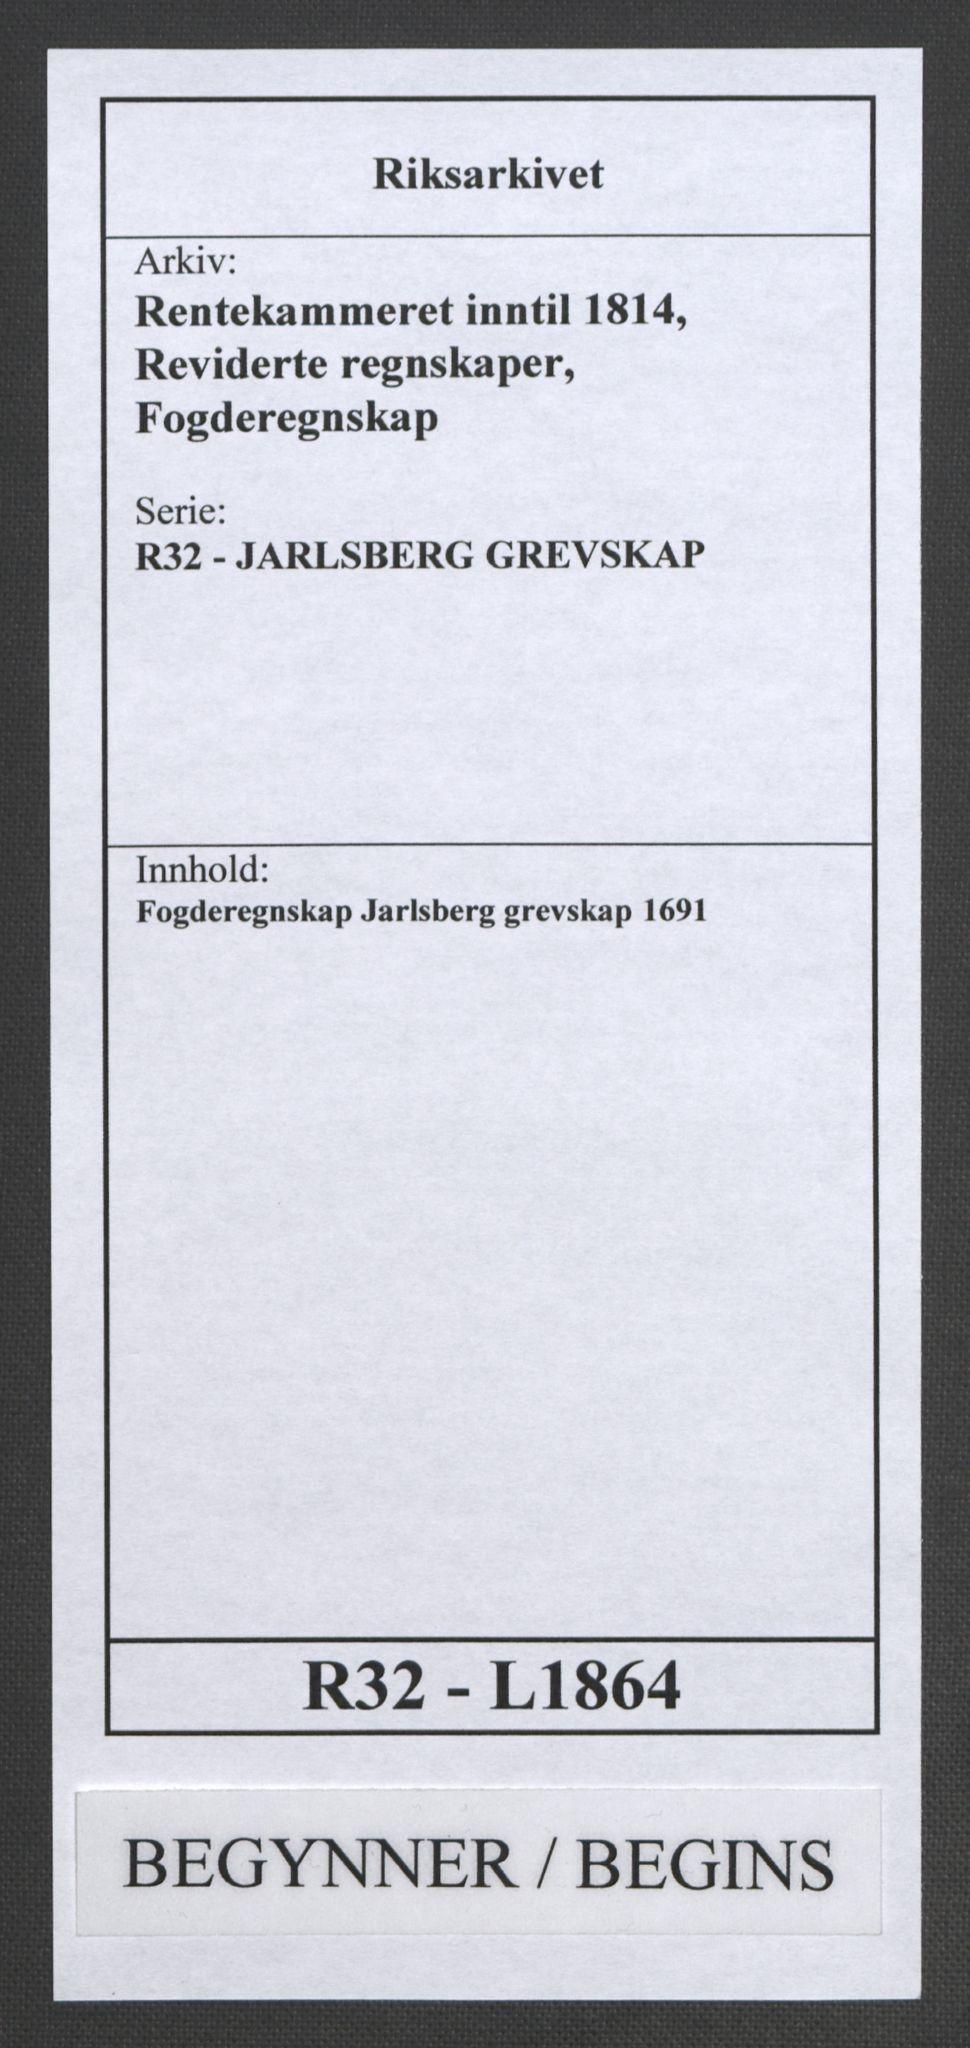 RA, Rentekammeret inntil 1814, Reviderte regnskaper, Fogderegnskap, R32/L1864: Fogderegnskap Jarlsberg grevskap, 1691, s. 1